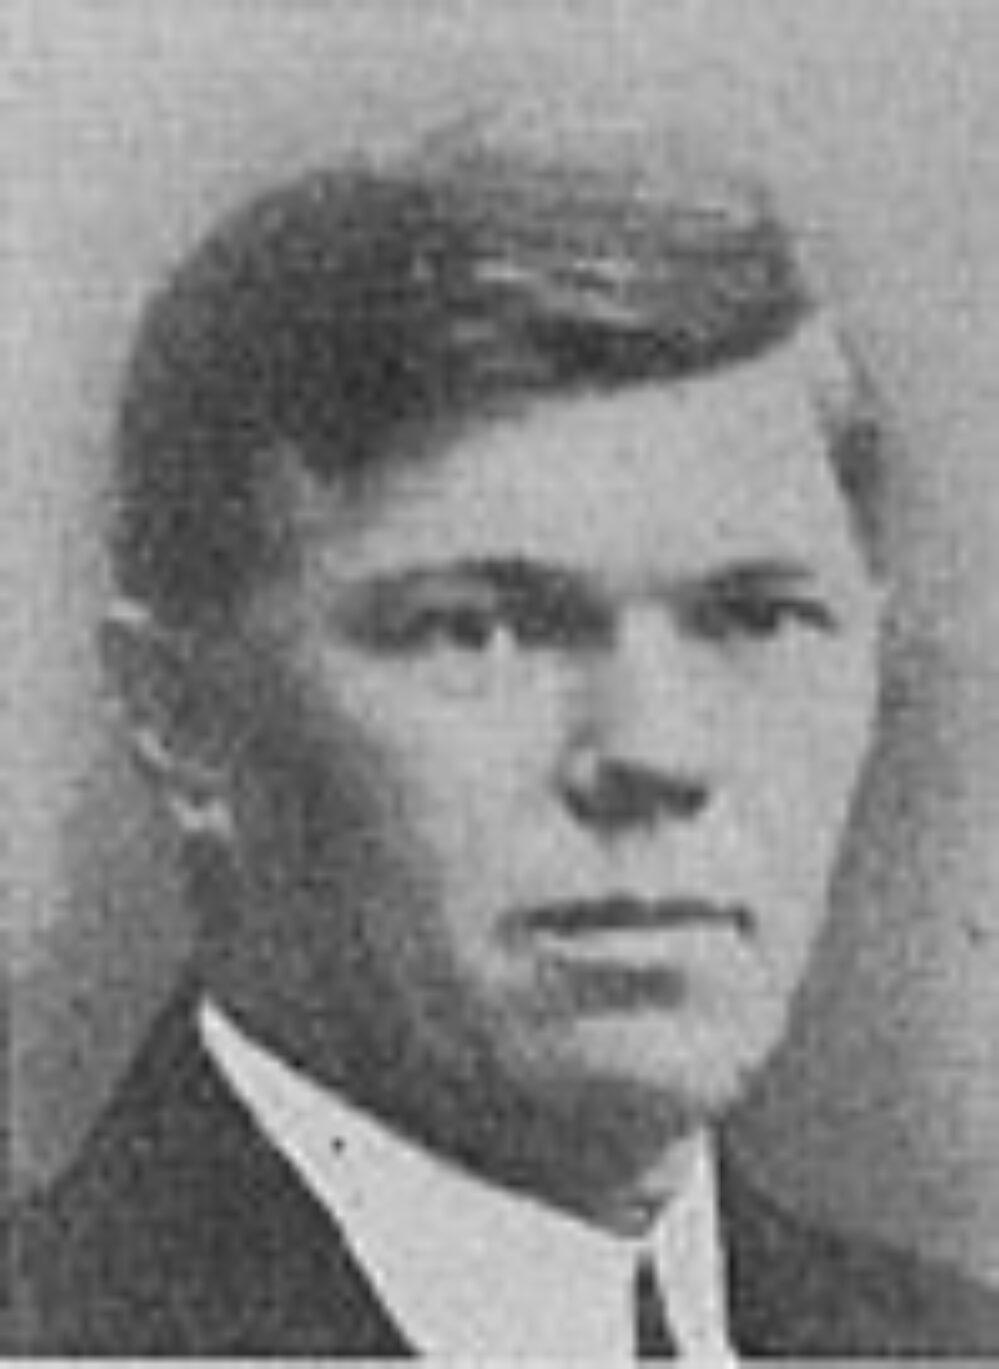 Kristian Sofus Klausen